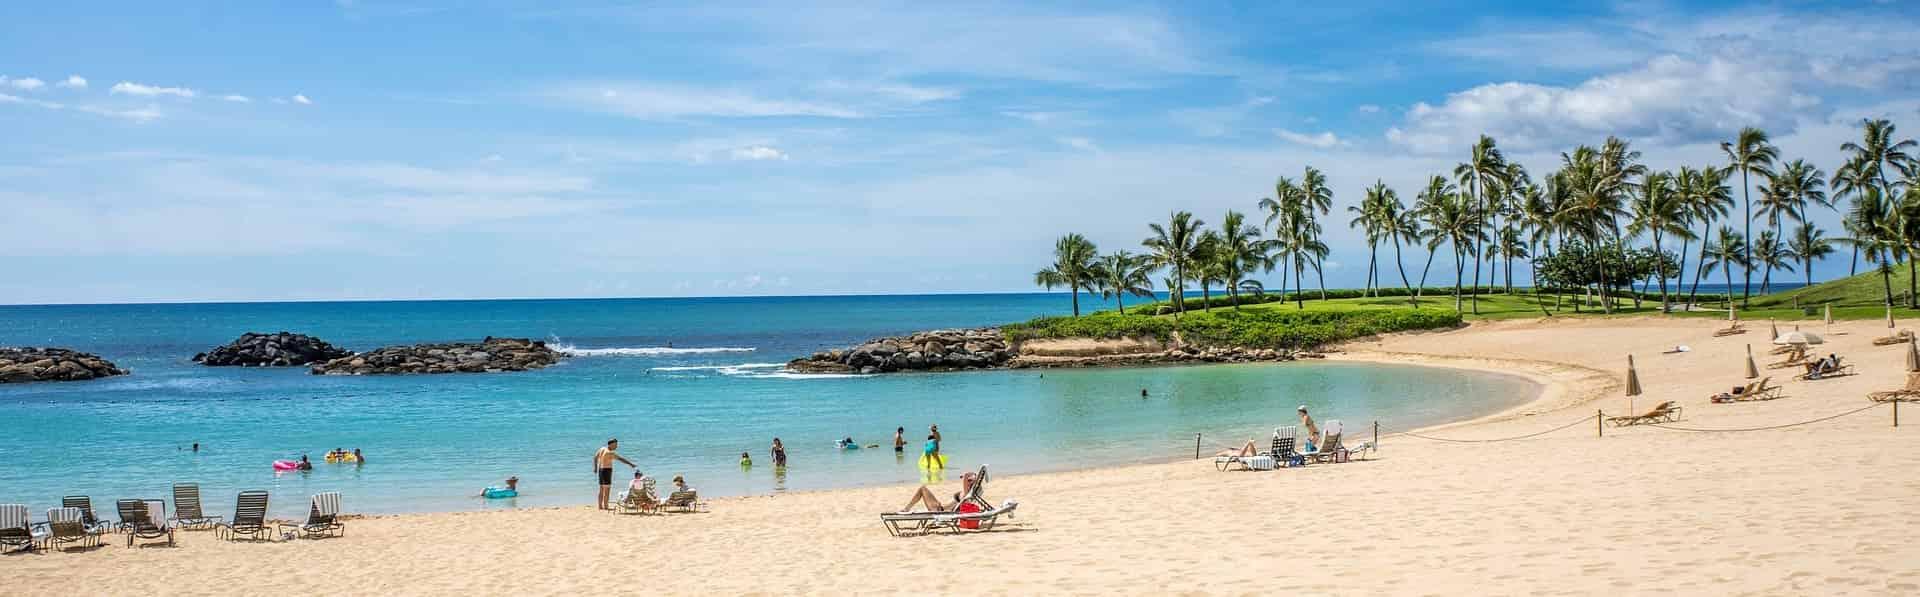 Hawai en español